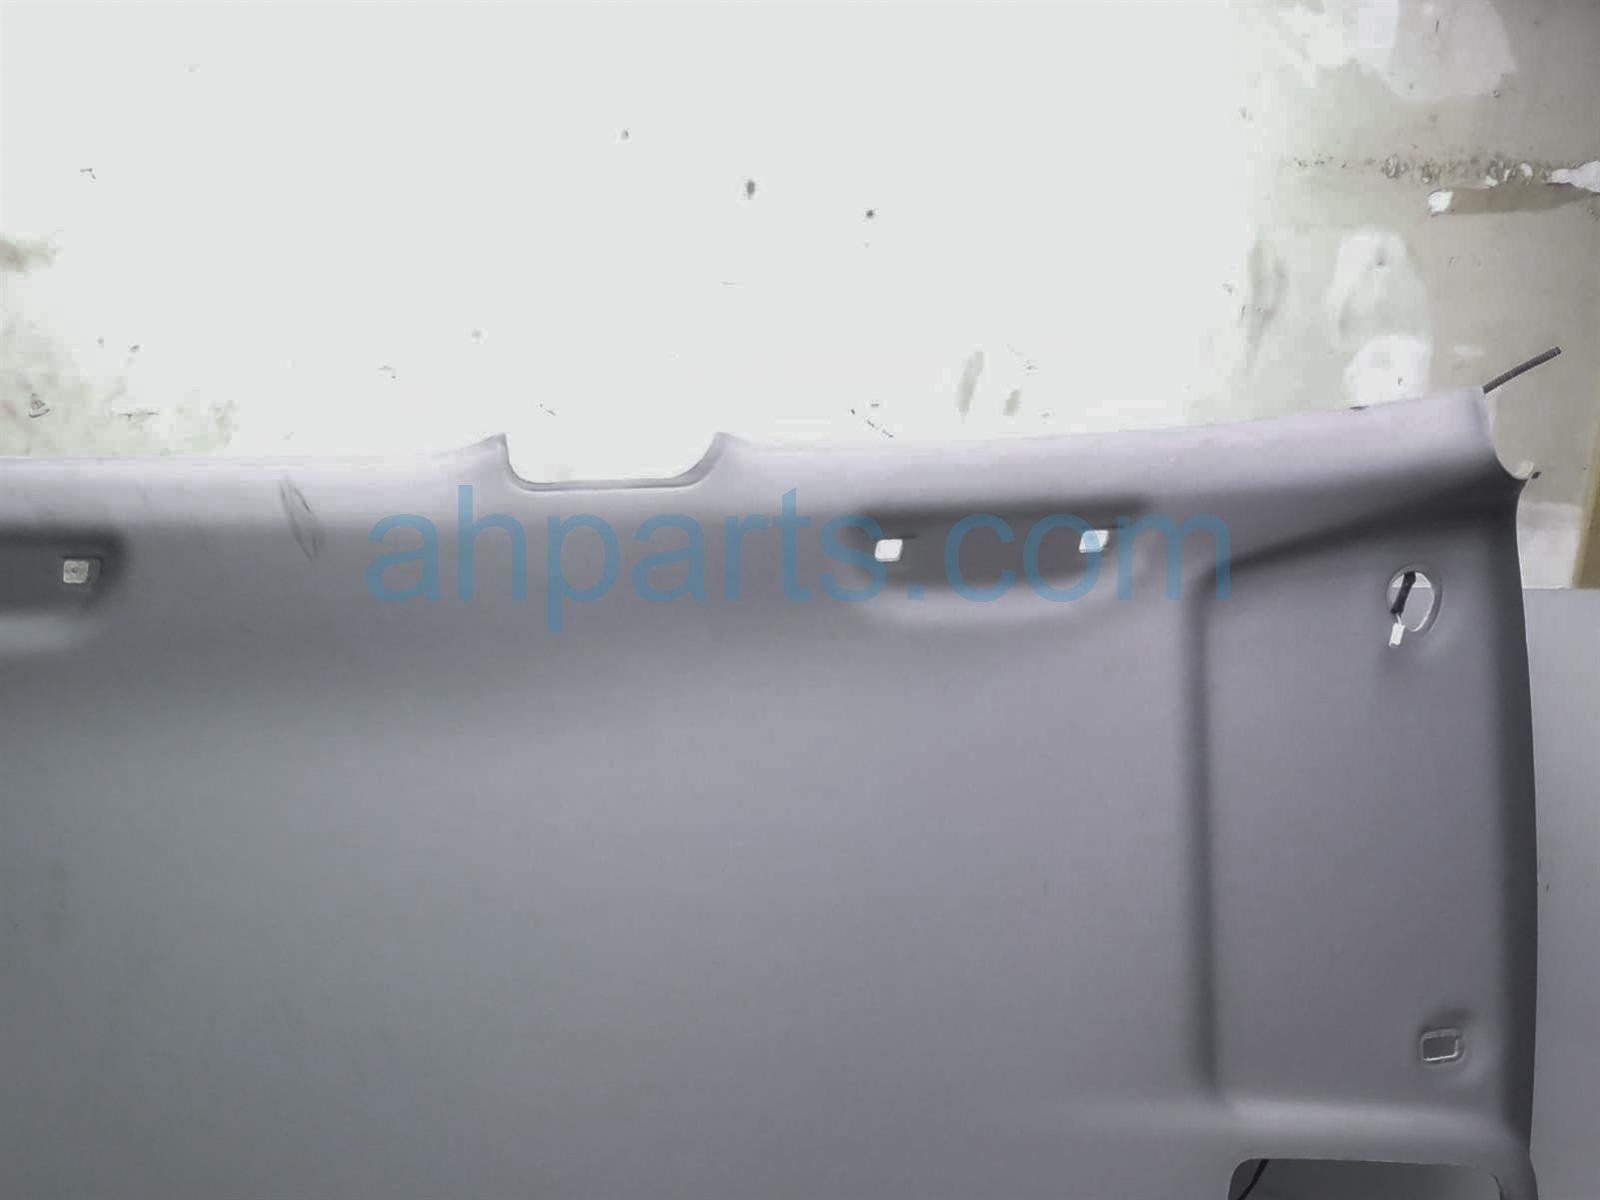 2019 Honda Pilot Headliner / Roof Lining   Gray 83201 TG7 A21ZB Replacement